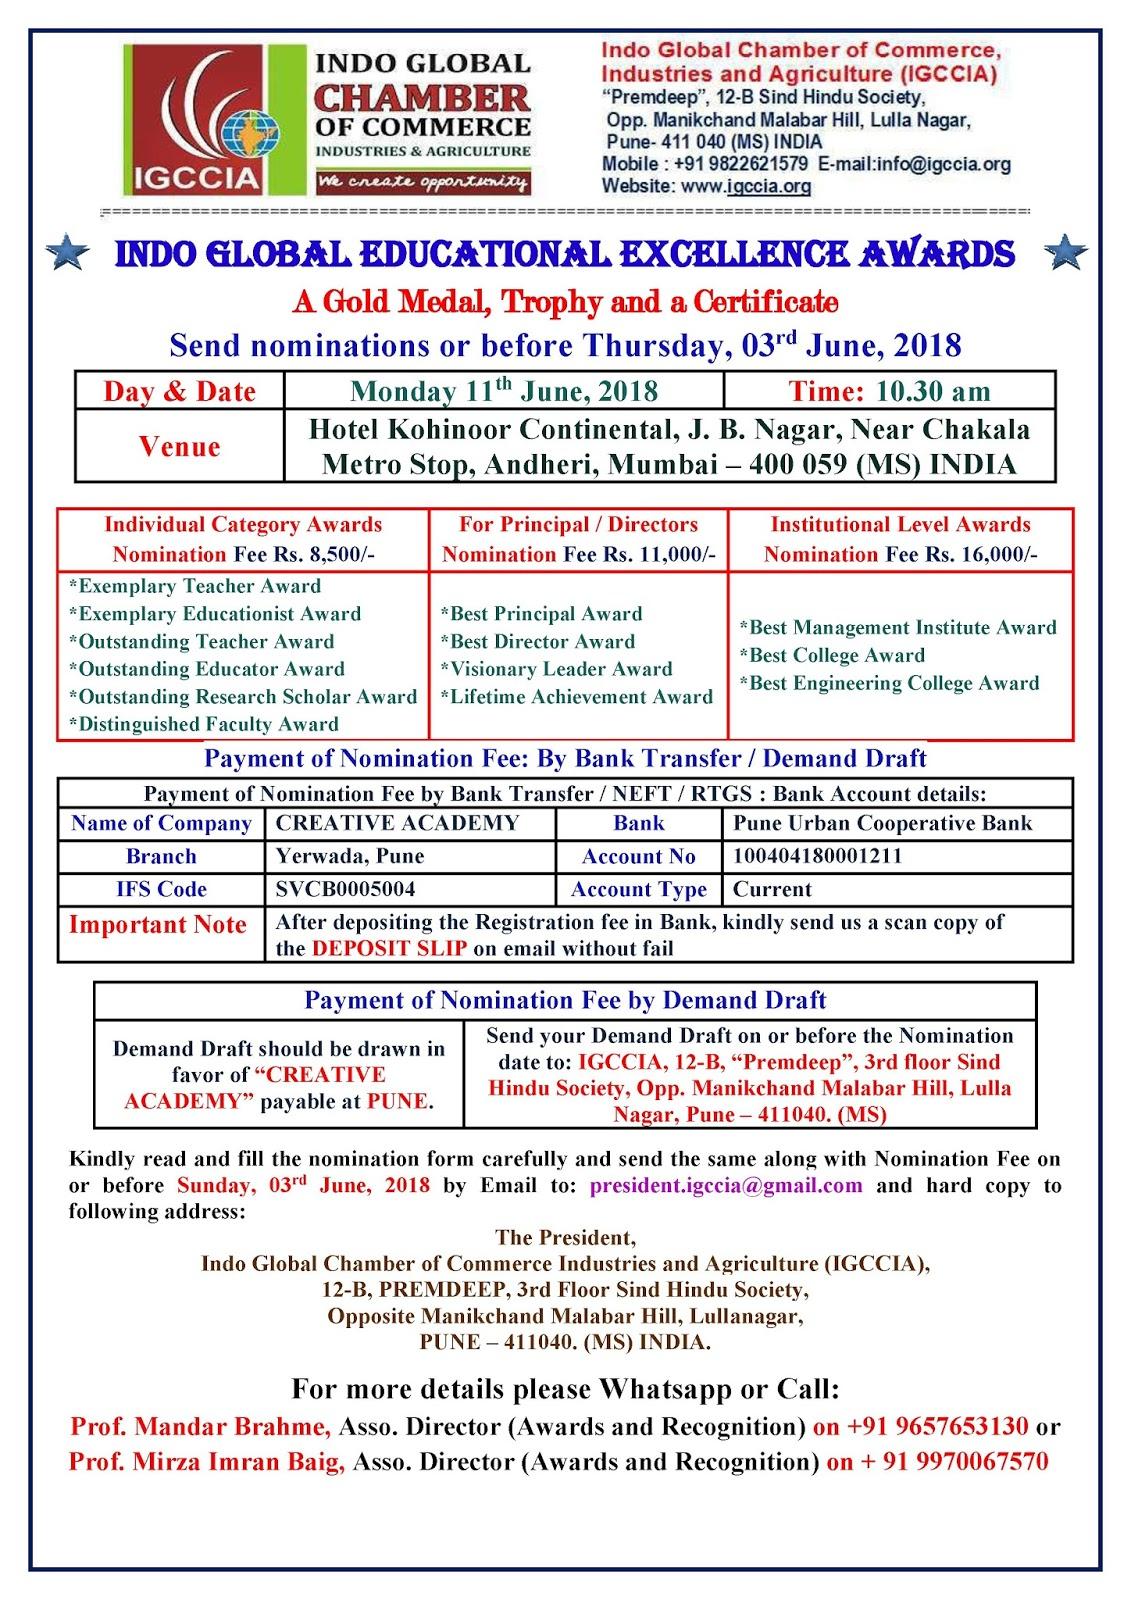 indo global educational excellence awards international multidisciplinary conferences on 11th june 2018 at hotel kohinoor continental andheri mumbai